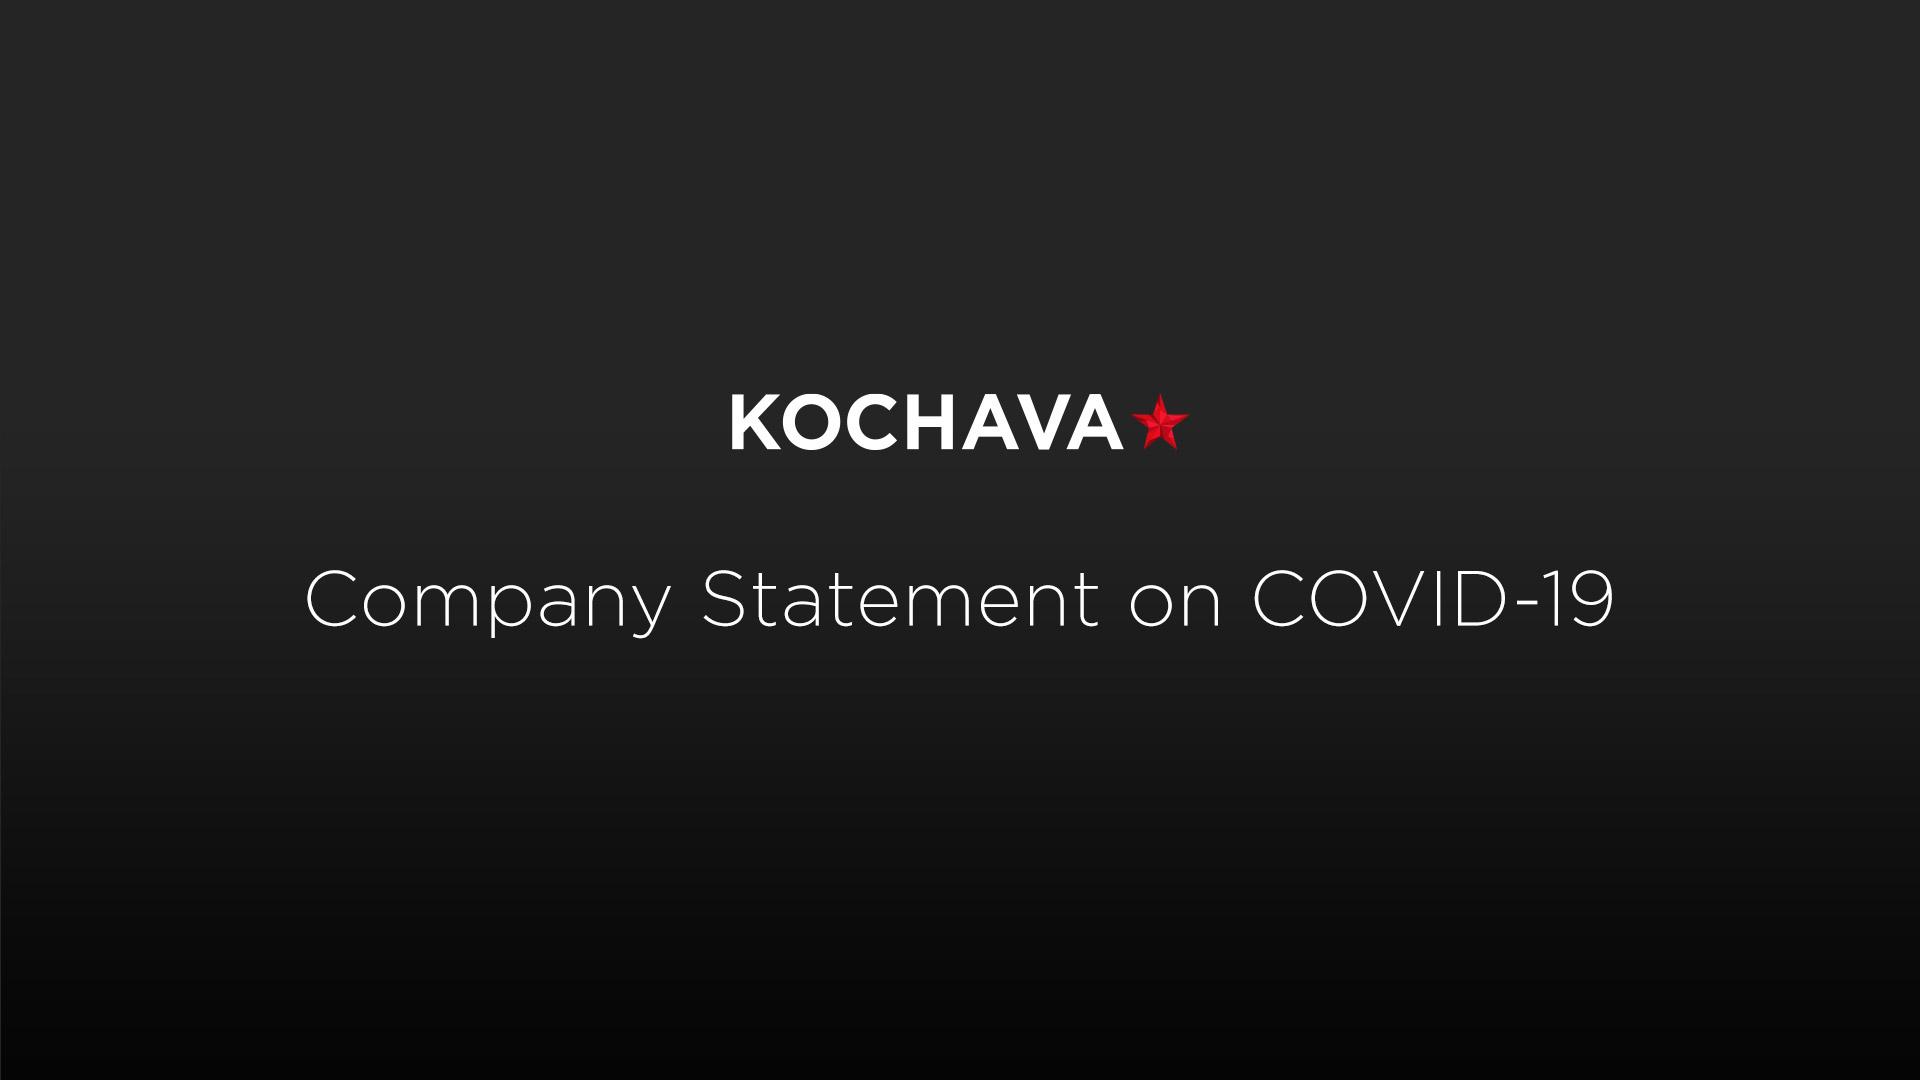 COVID-19 Kochava statement